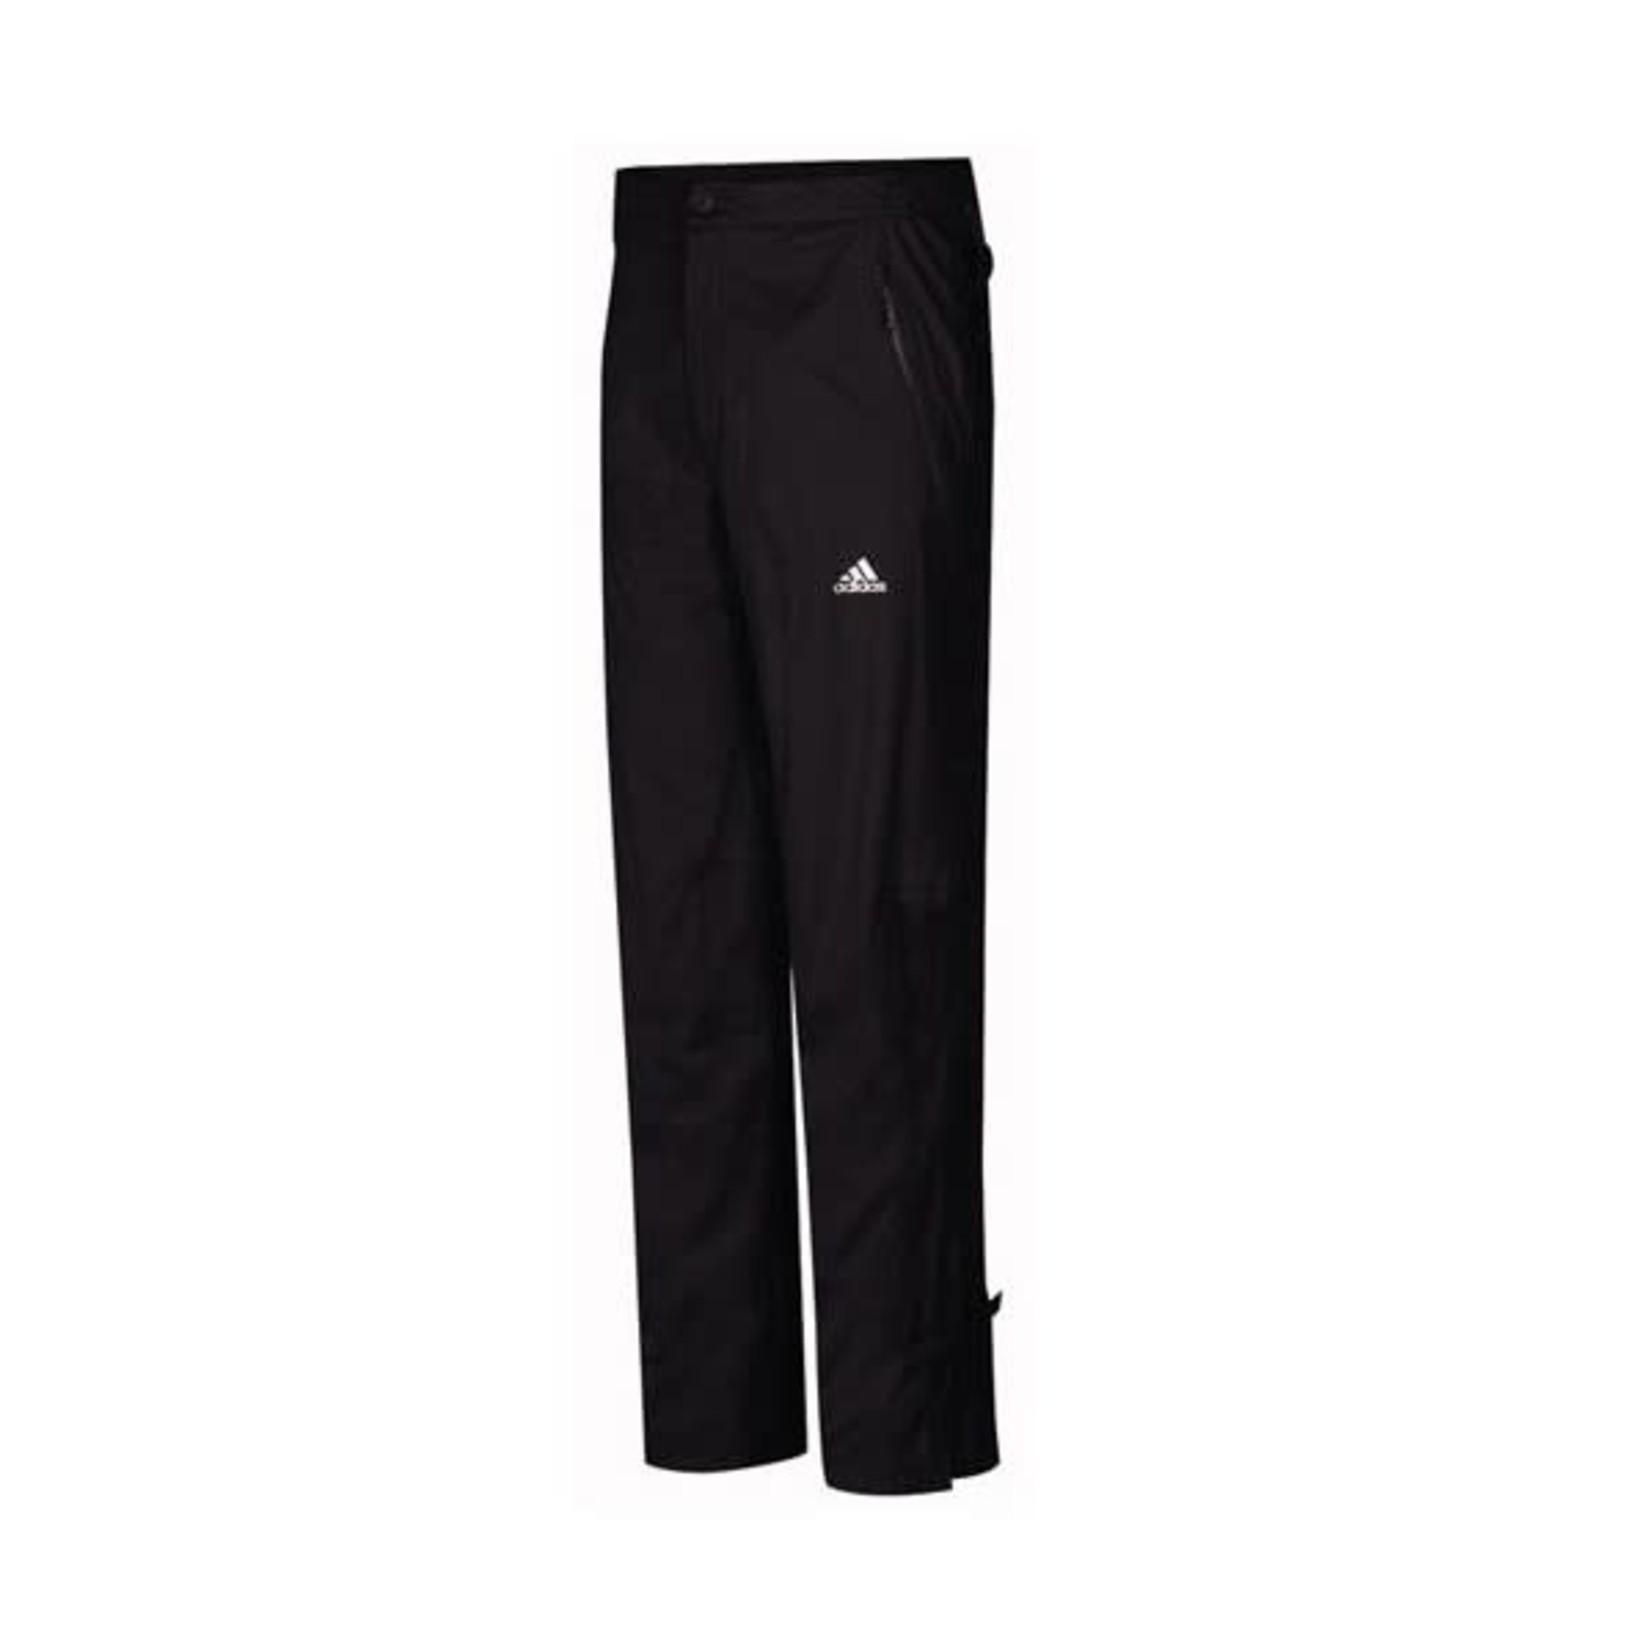 Adidas Adidas Climaproof Storm Pant black XXL